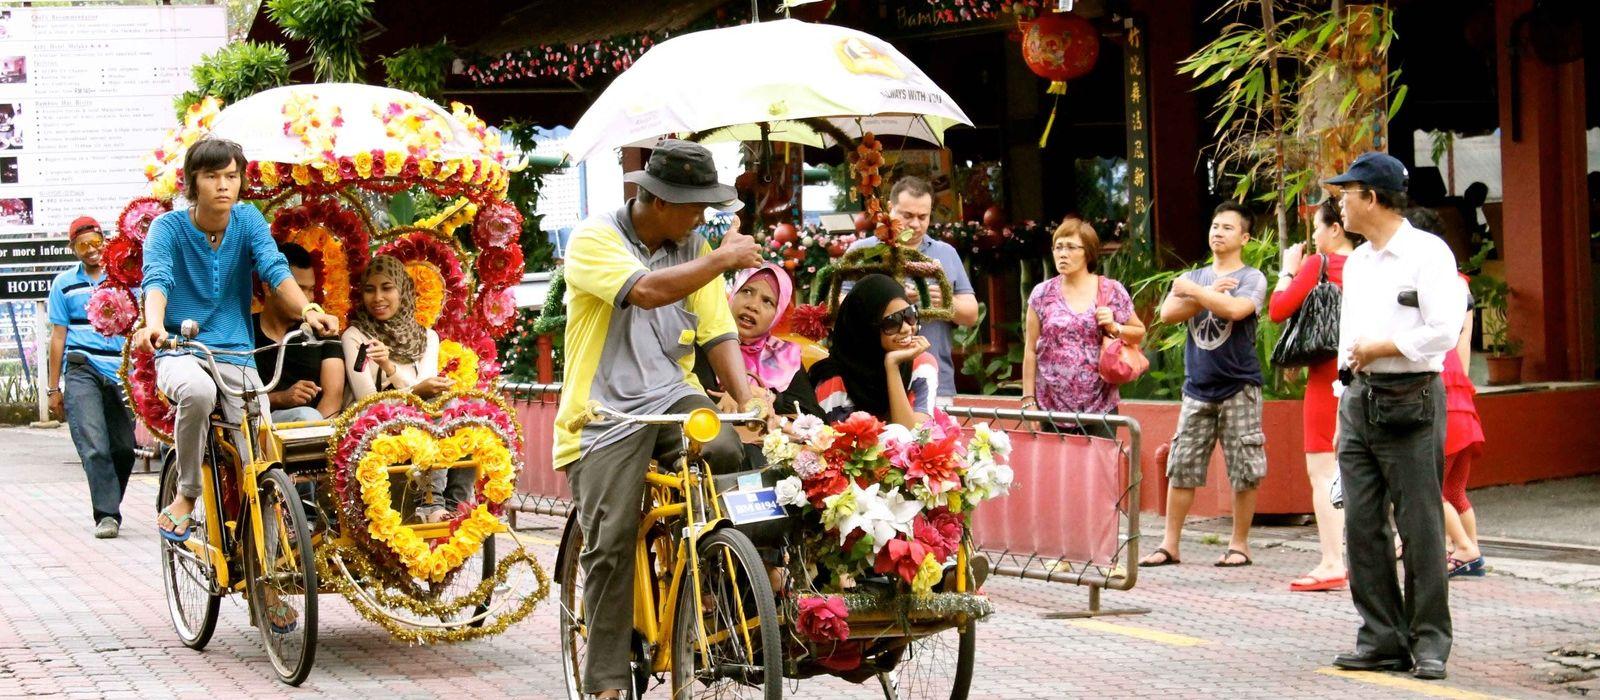 Singapur und Malaysias Halbinsel Urlaub 3